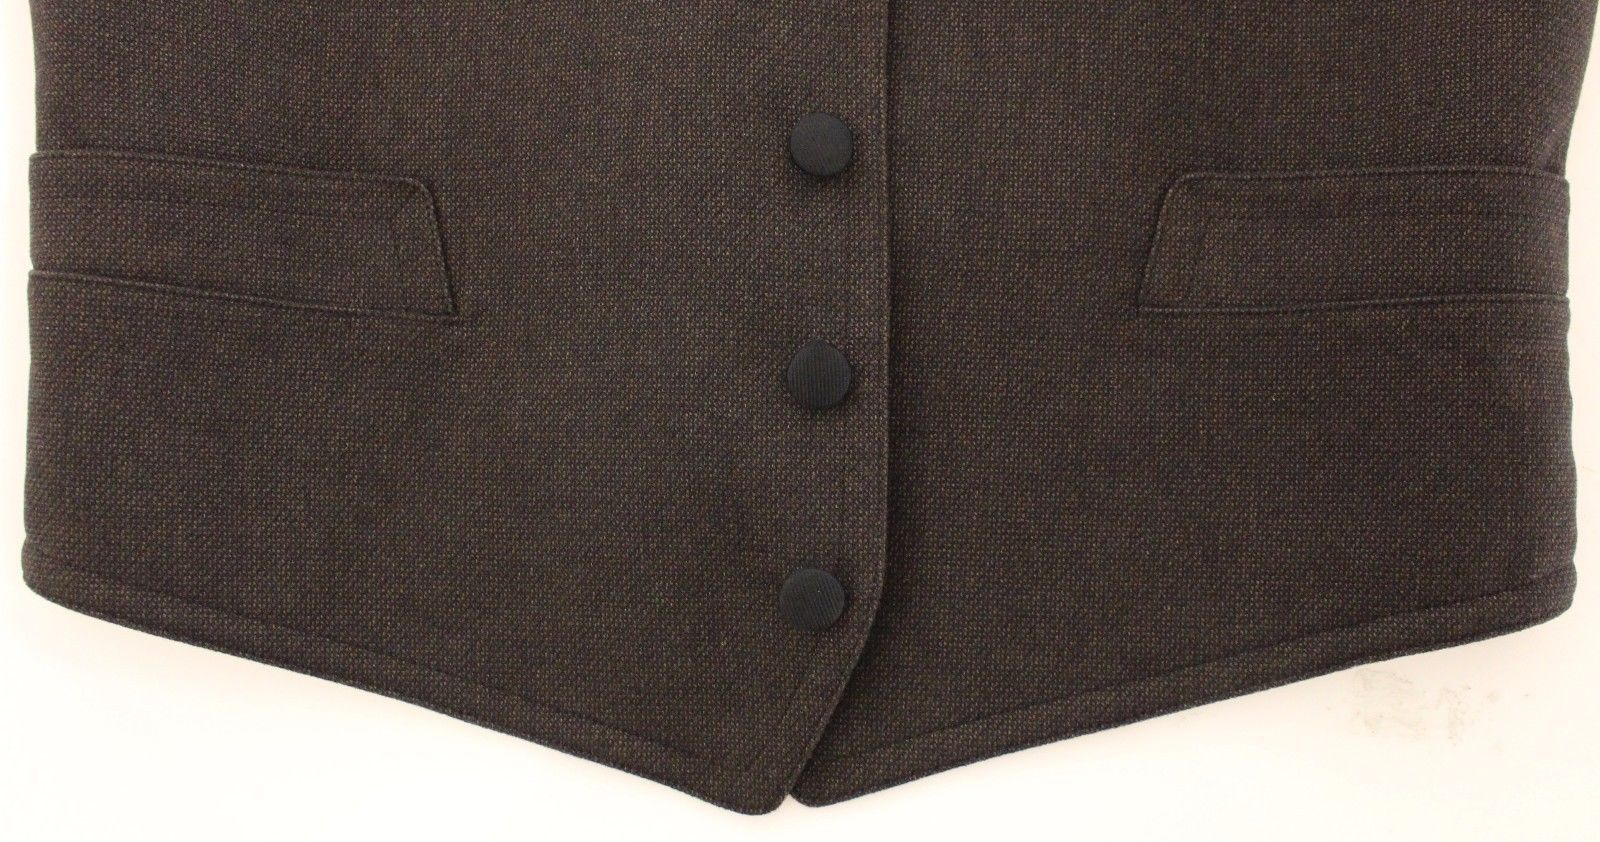 Dolce & Gabbana Brown Cotton Blend Dress Vest Gilet